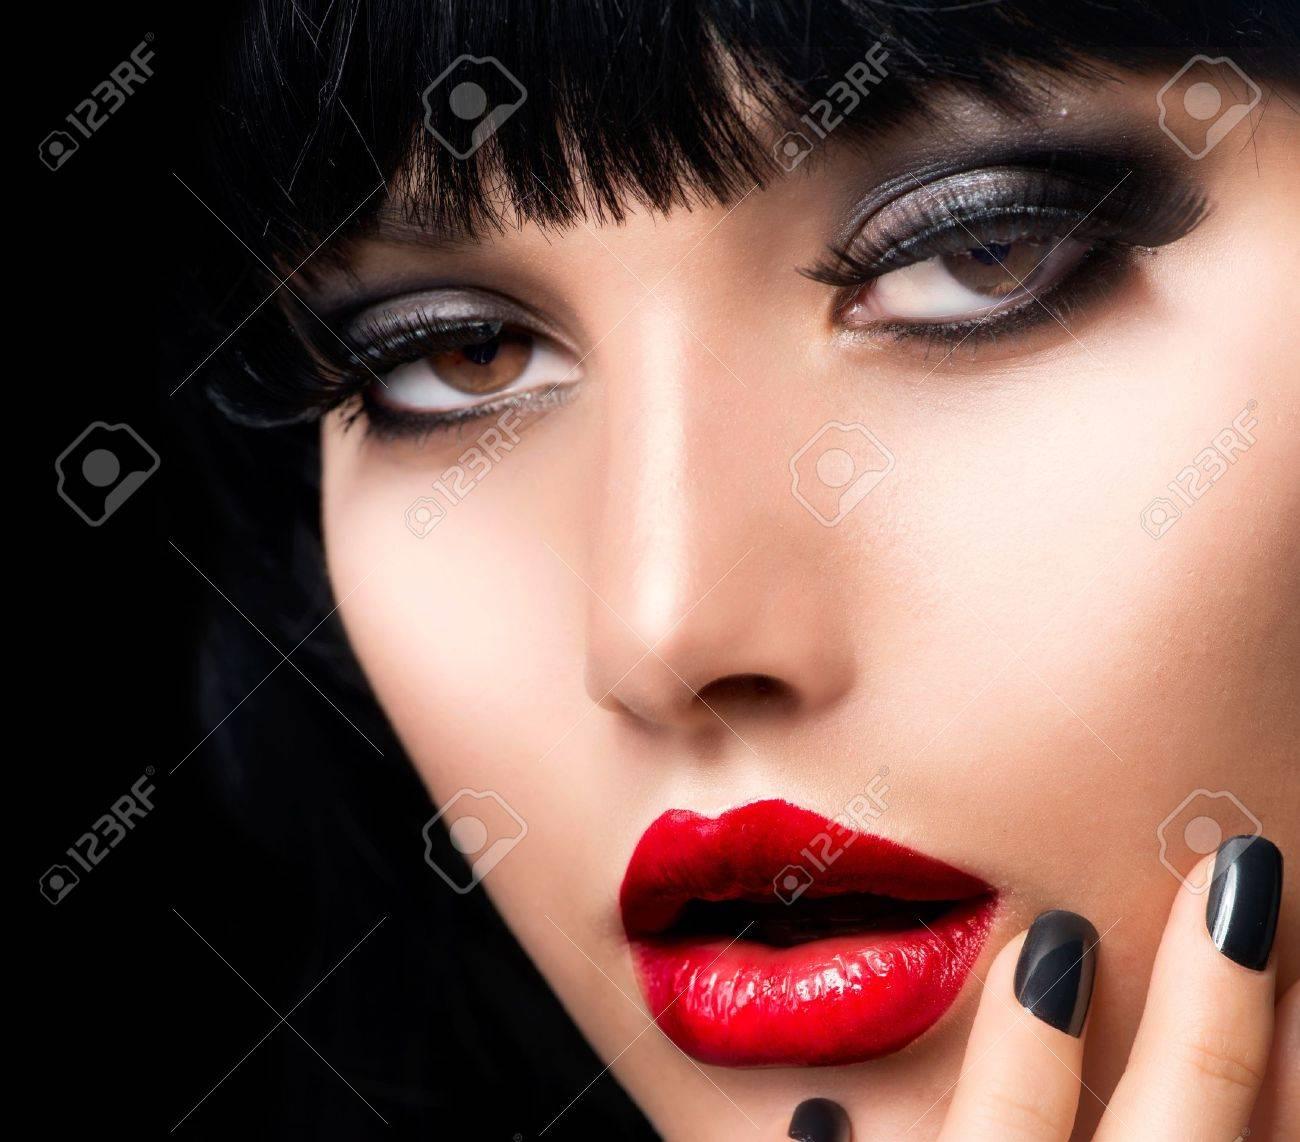 Beautiful Brunette Girl Portrait  Face  Makeup  Sensual Red Lips Stock Photo - 15658029